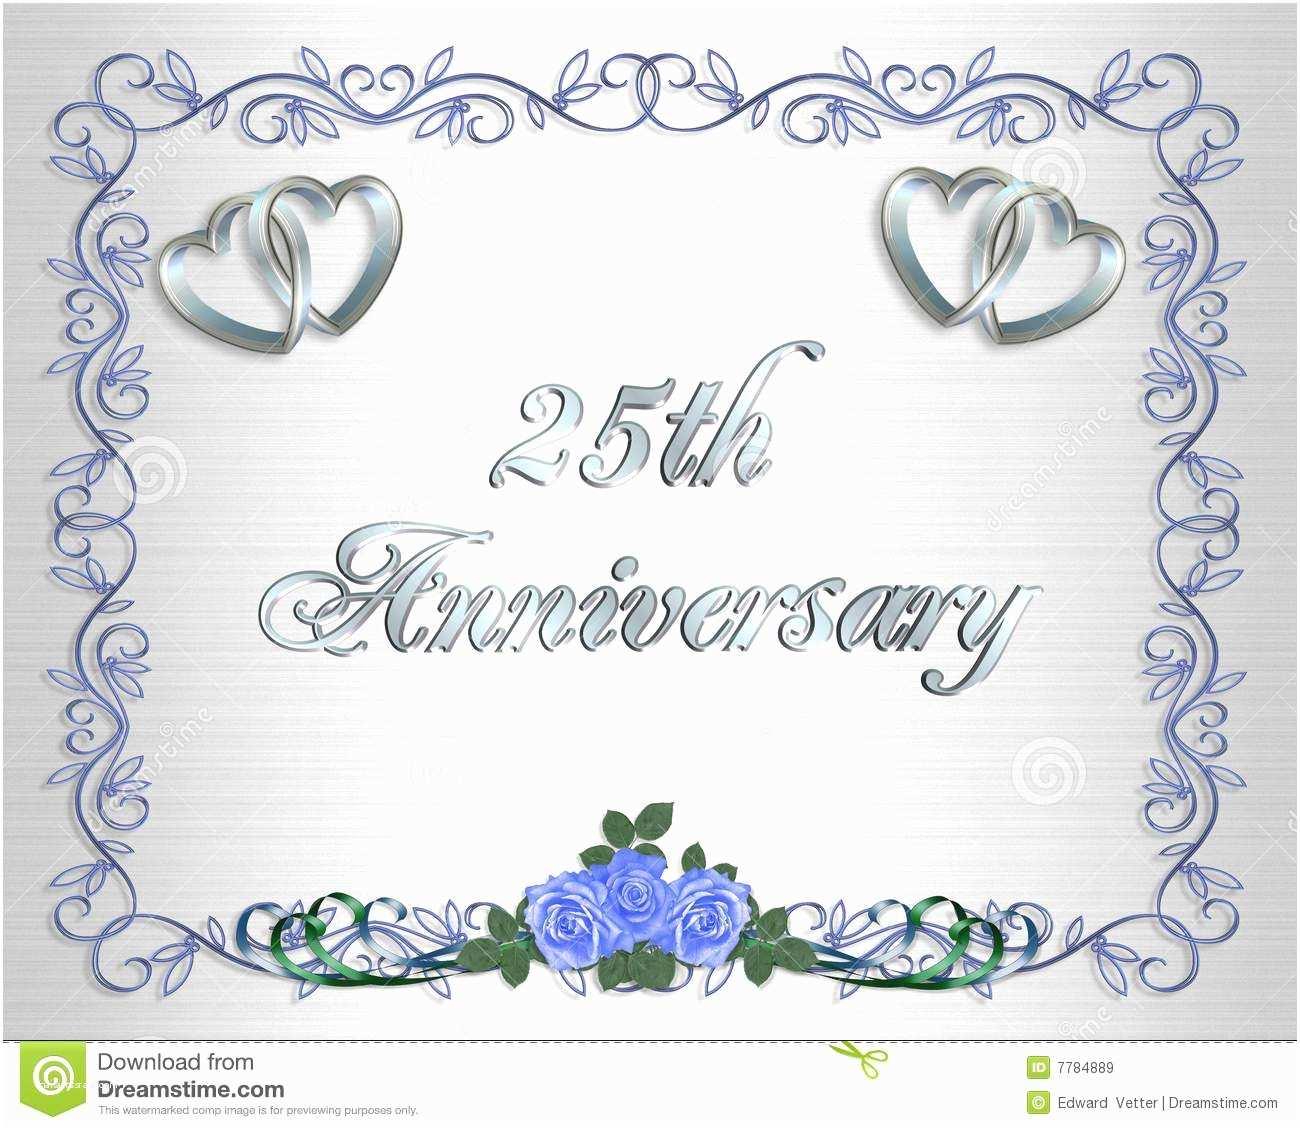 60th Wedding Anniversary Invitations Free Templates Wedding Anniversary Invitation Template Free